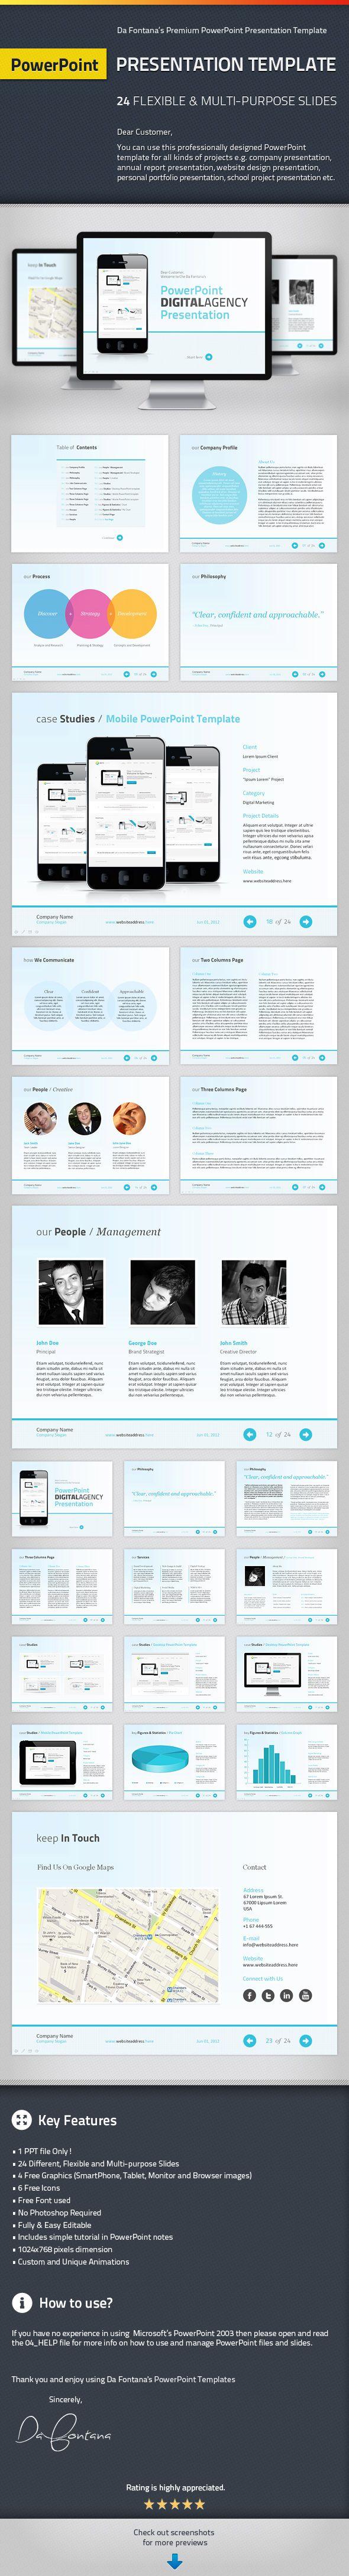 PowerPoint Agency / Personal Presentation Template by CheDaFontana.deviantart.com on @deviantART